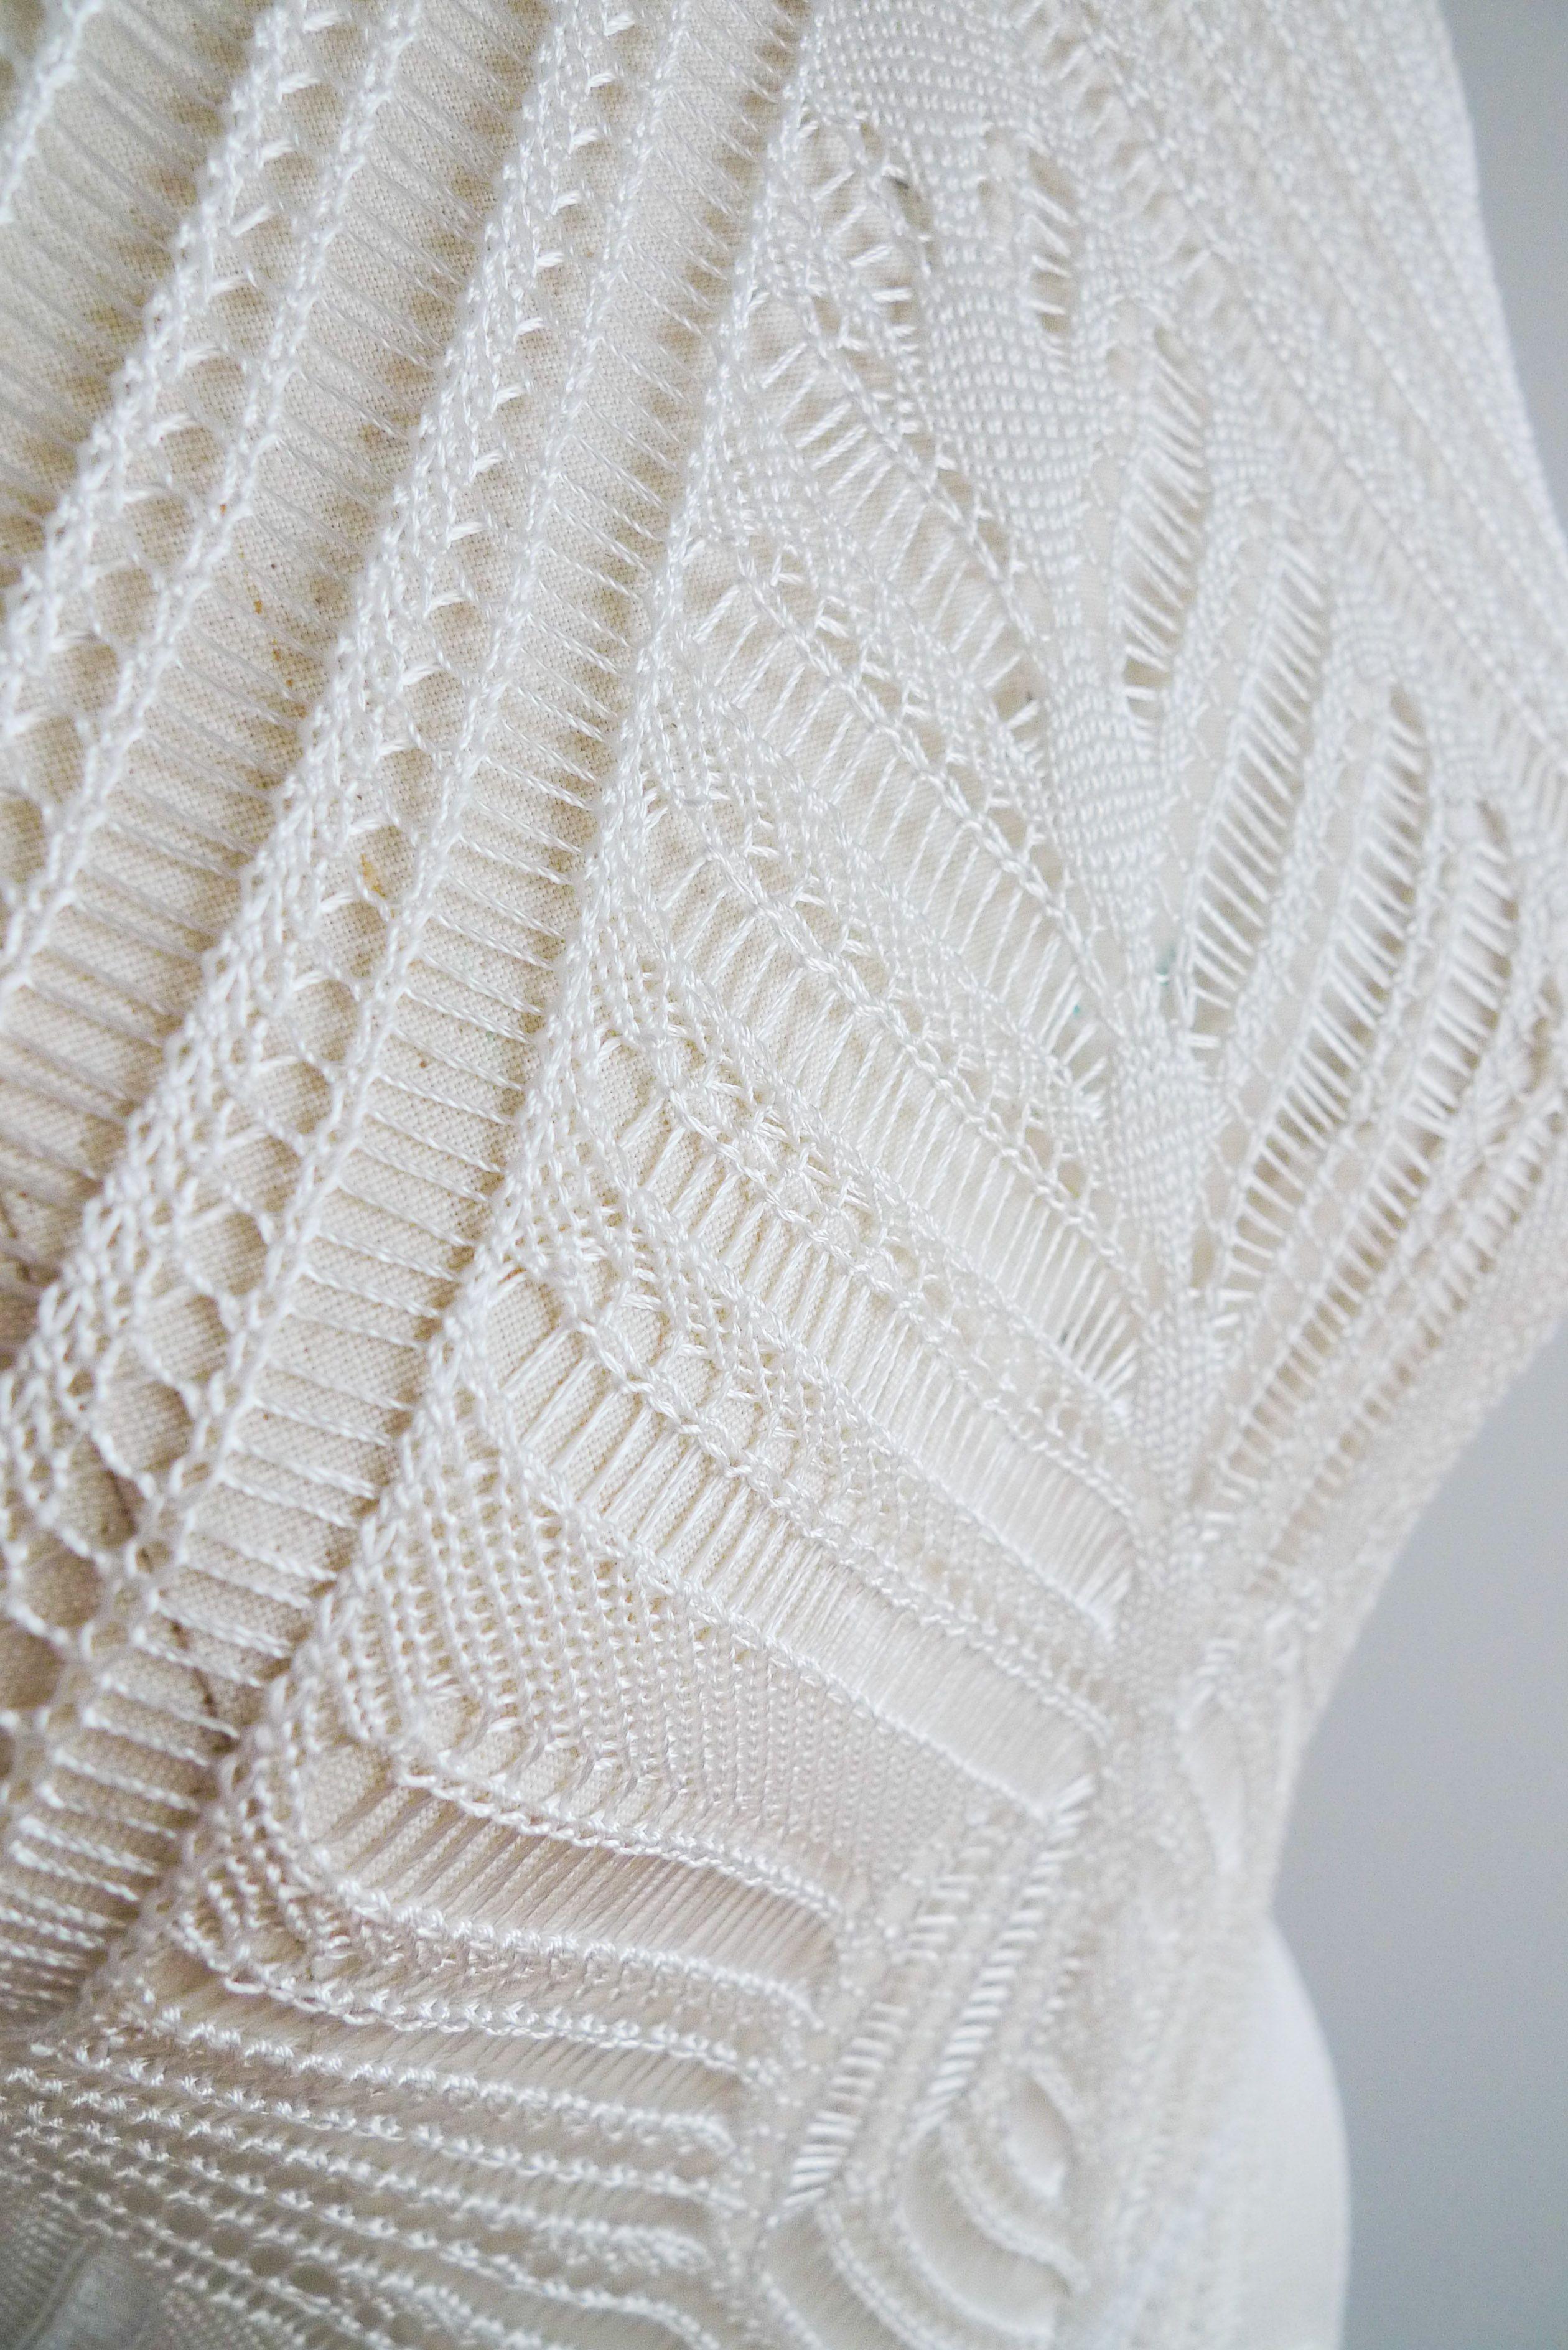 Knit detail | KNIT | Pinterest | Tejido